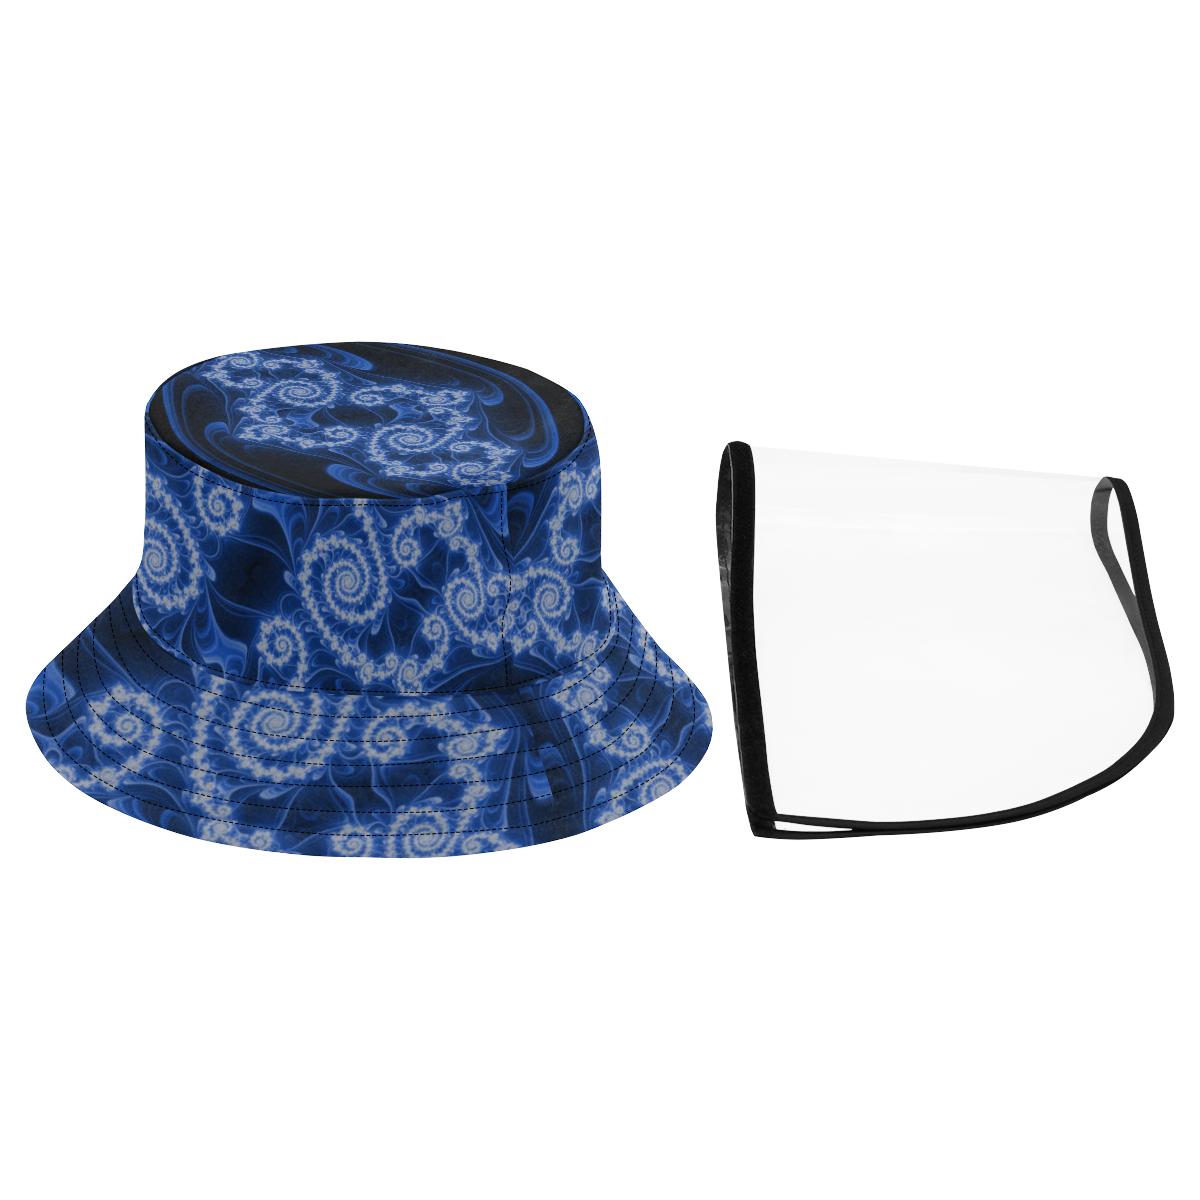 Delicate Blue White Lace Fractal Abstract Women's Bucket Hat (Detachable Face Shield)